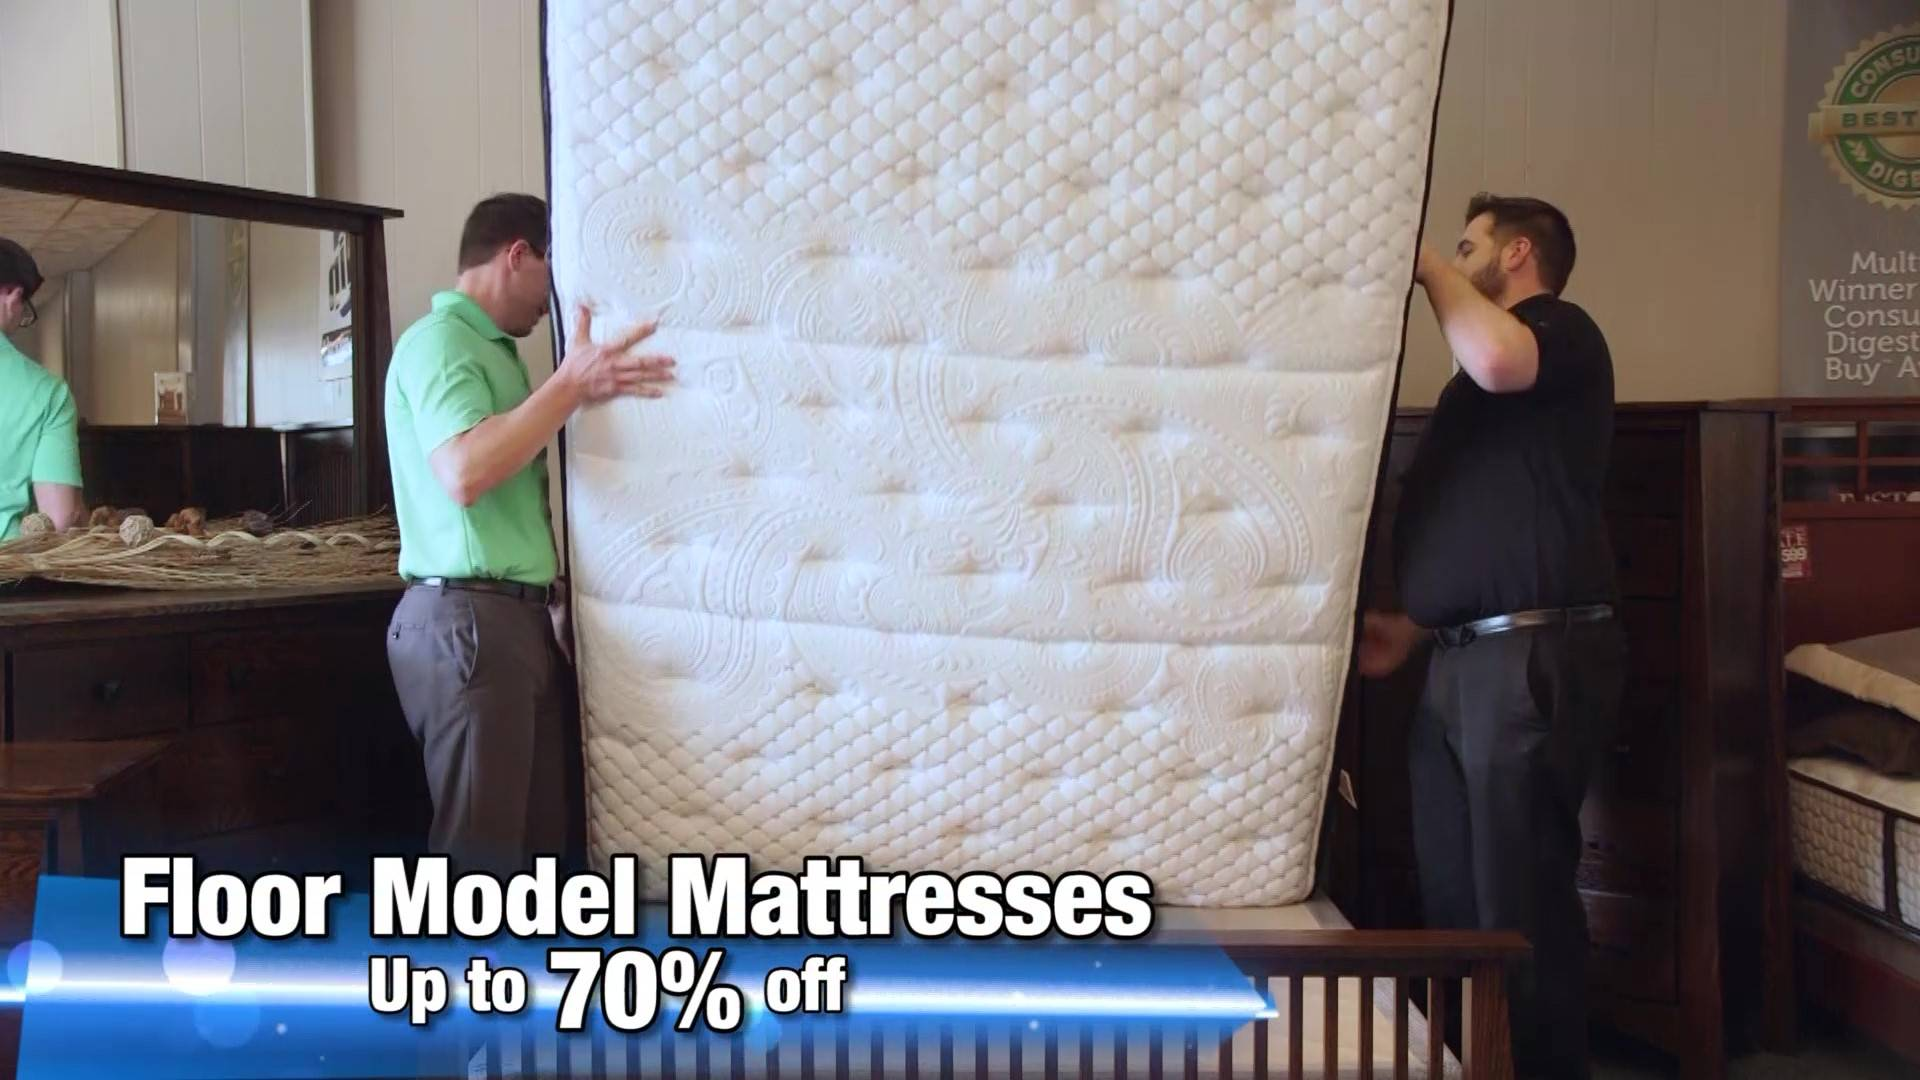 Rosemount Mattress Superstore And Bed Shop Www Landodreams Com